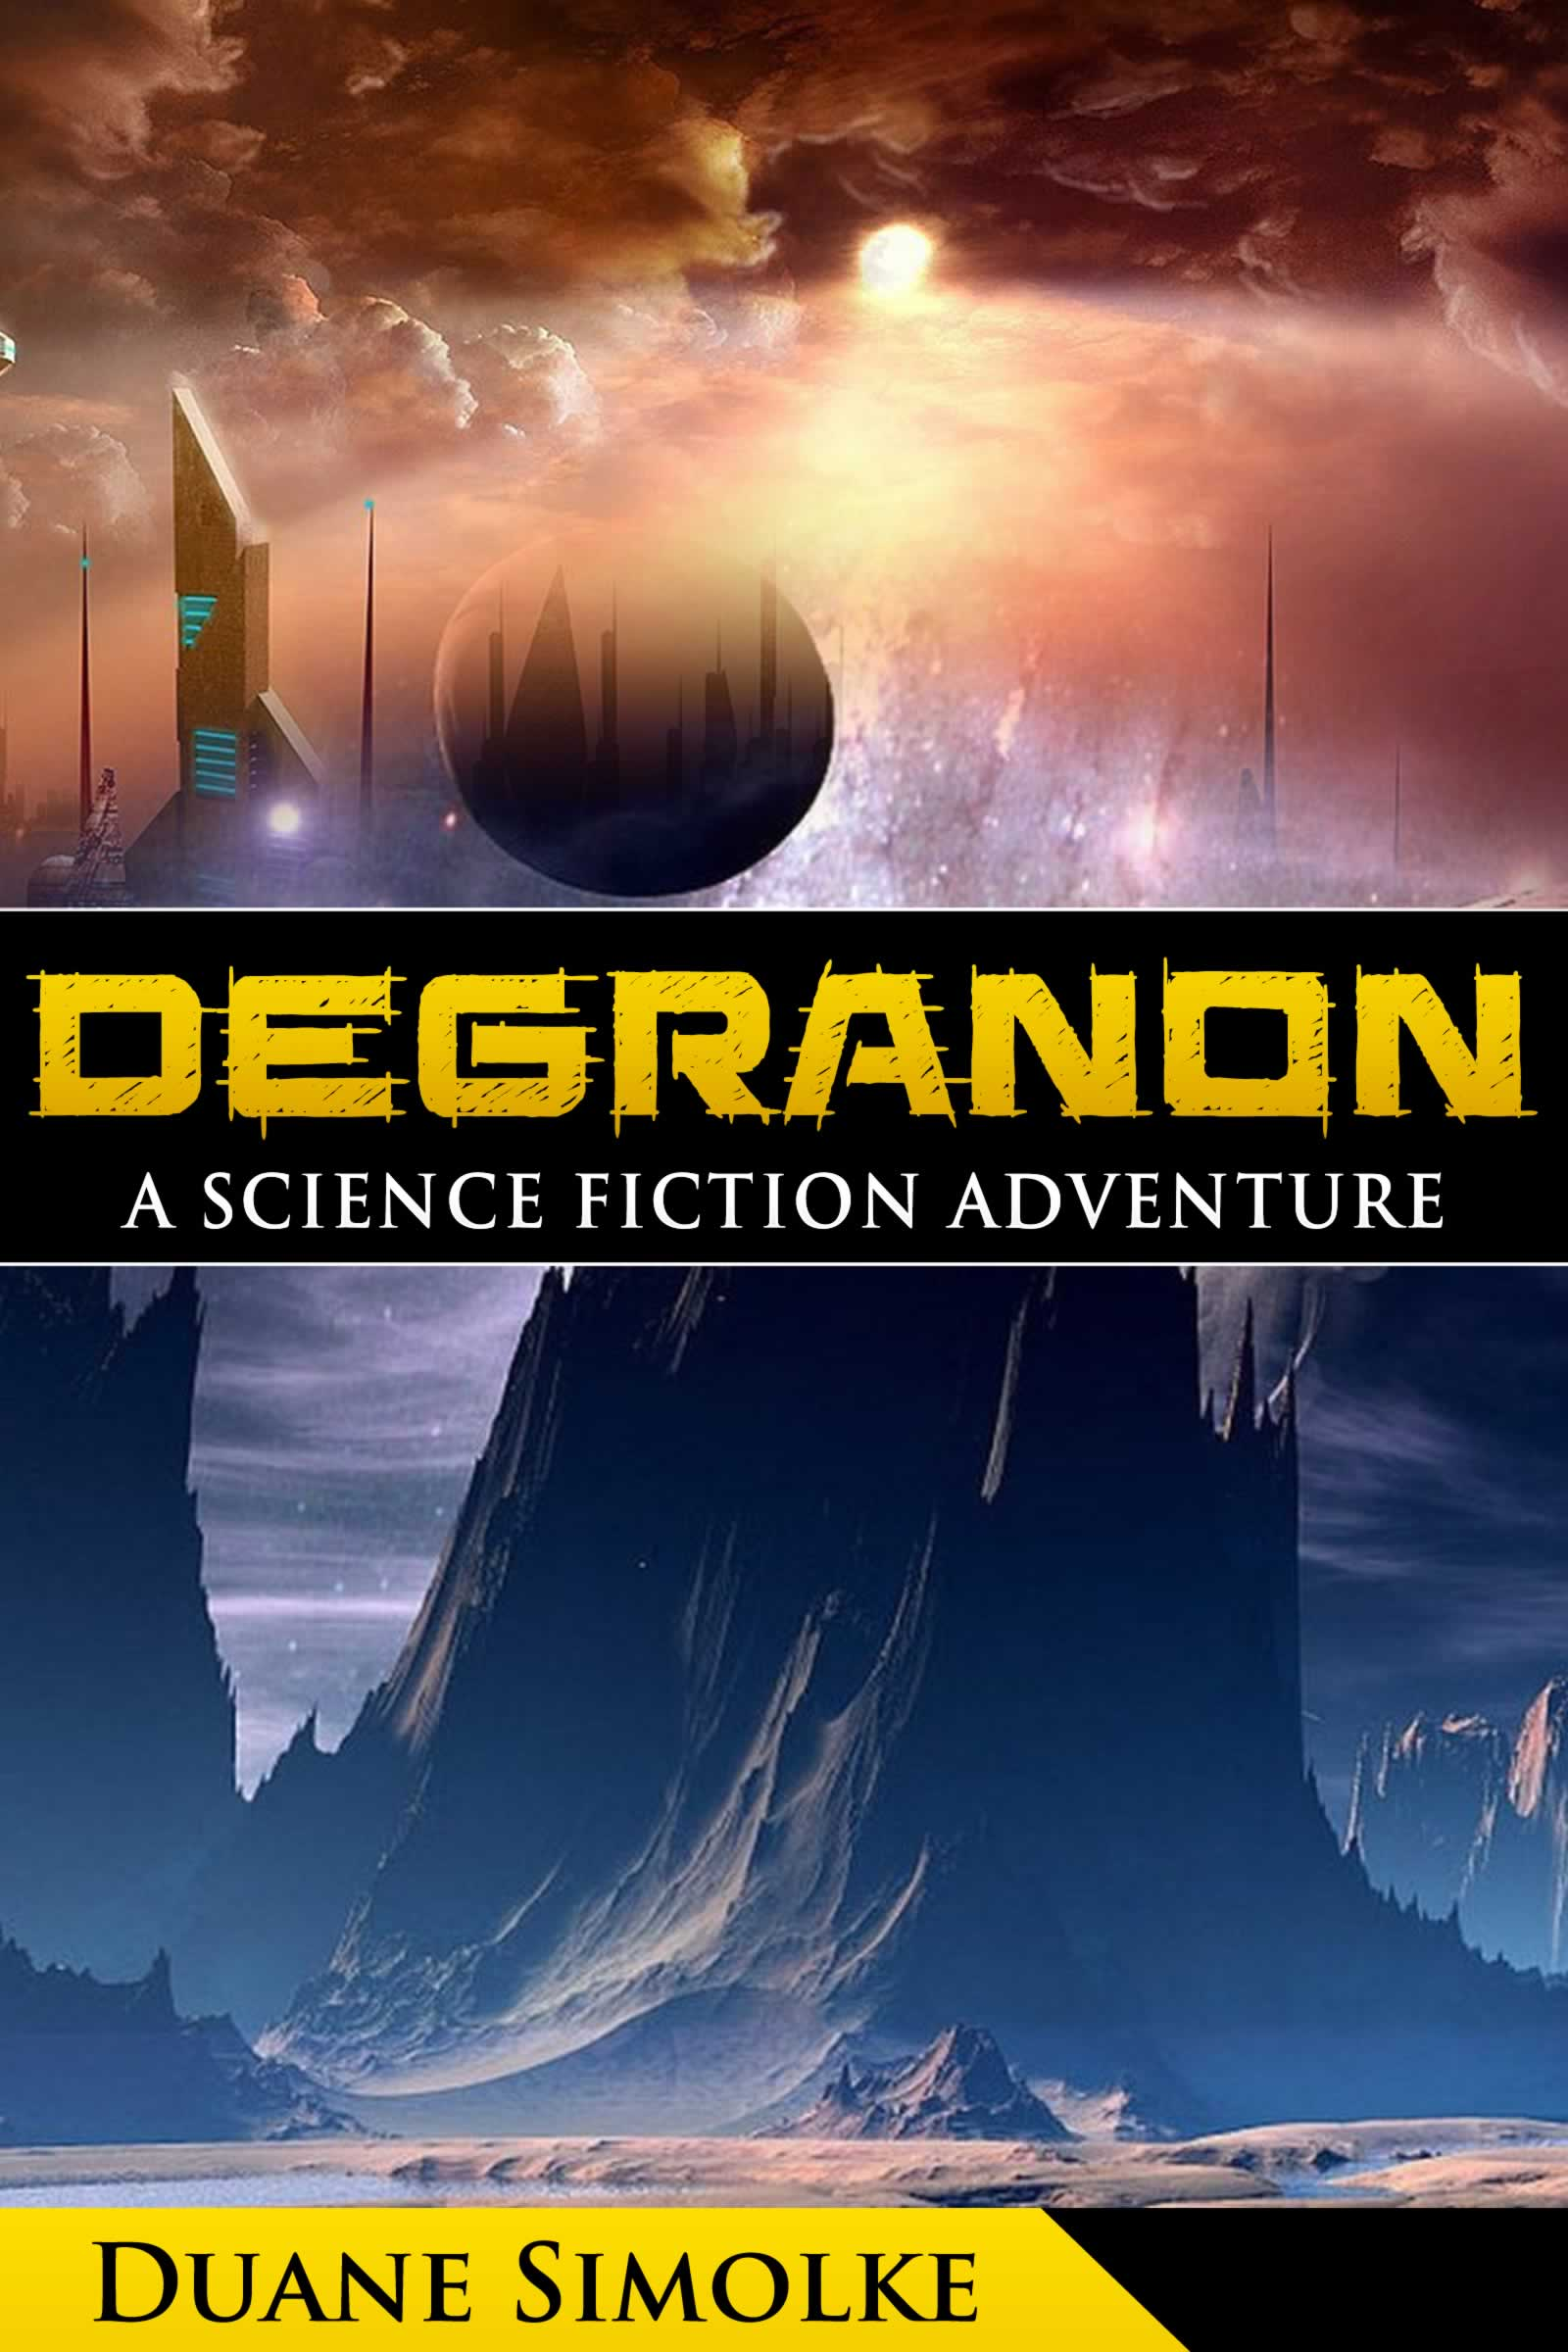 Degranon: A Science Fiction Adventure's Ebook Image